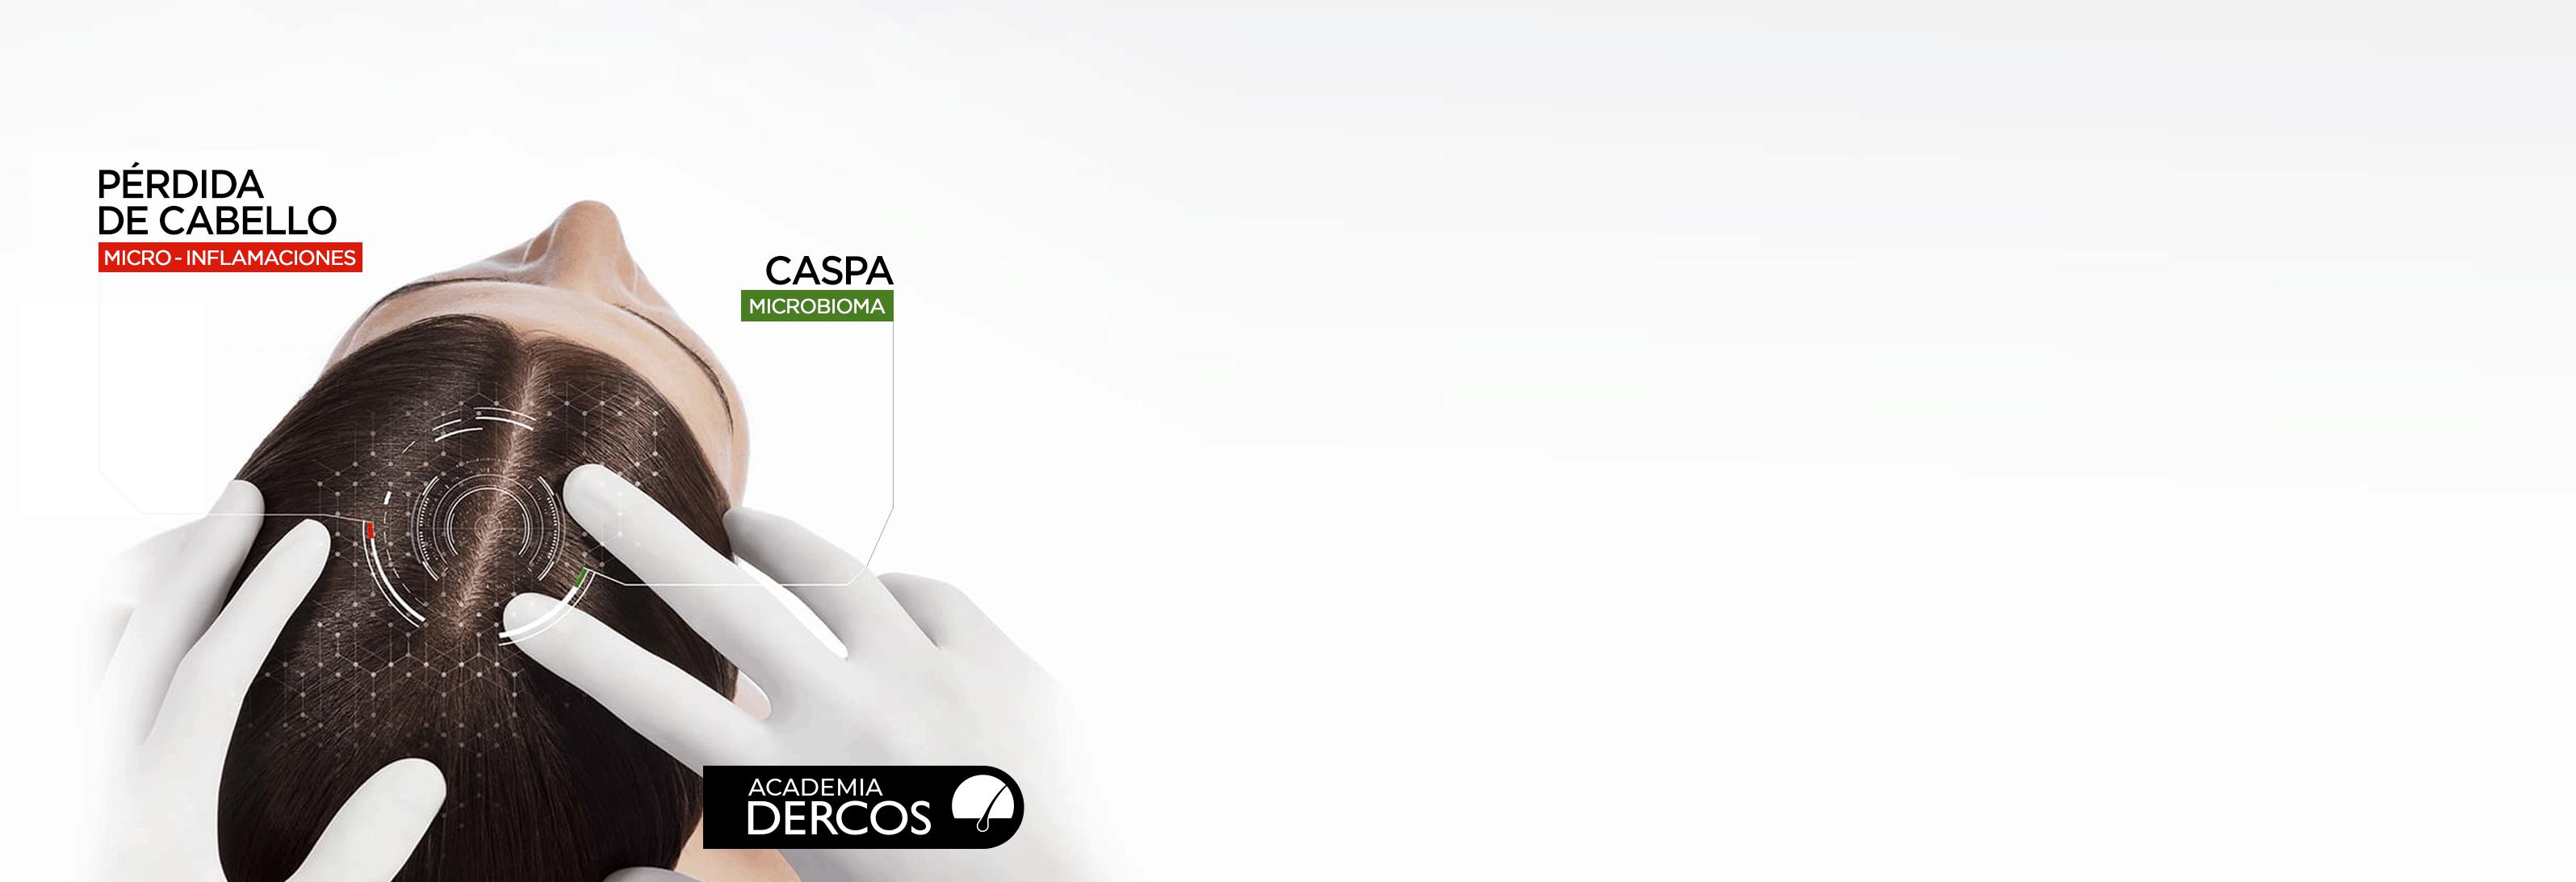 banner desktop academia dercos 2